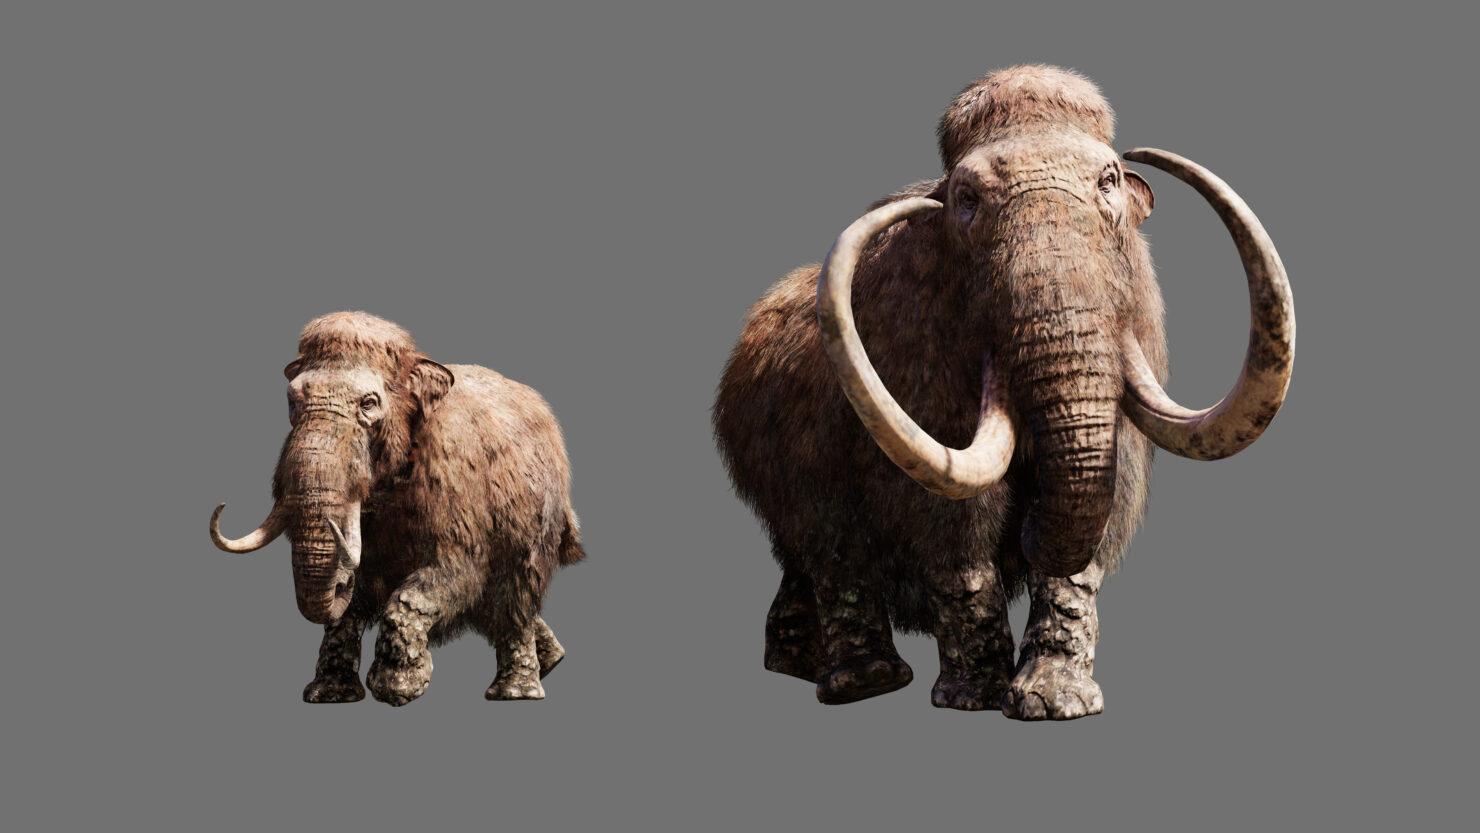 fcp_render_mammoths_beastmaster_reveal_151204_5am_cet_1449251223